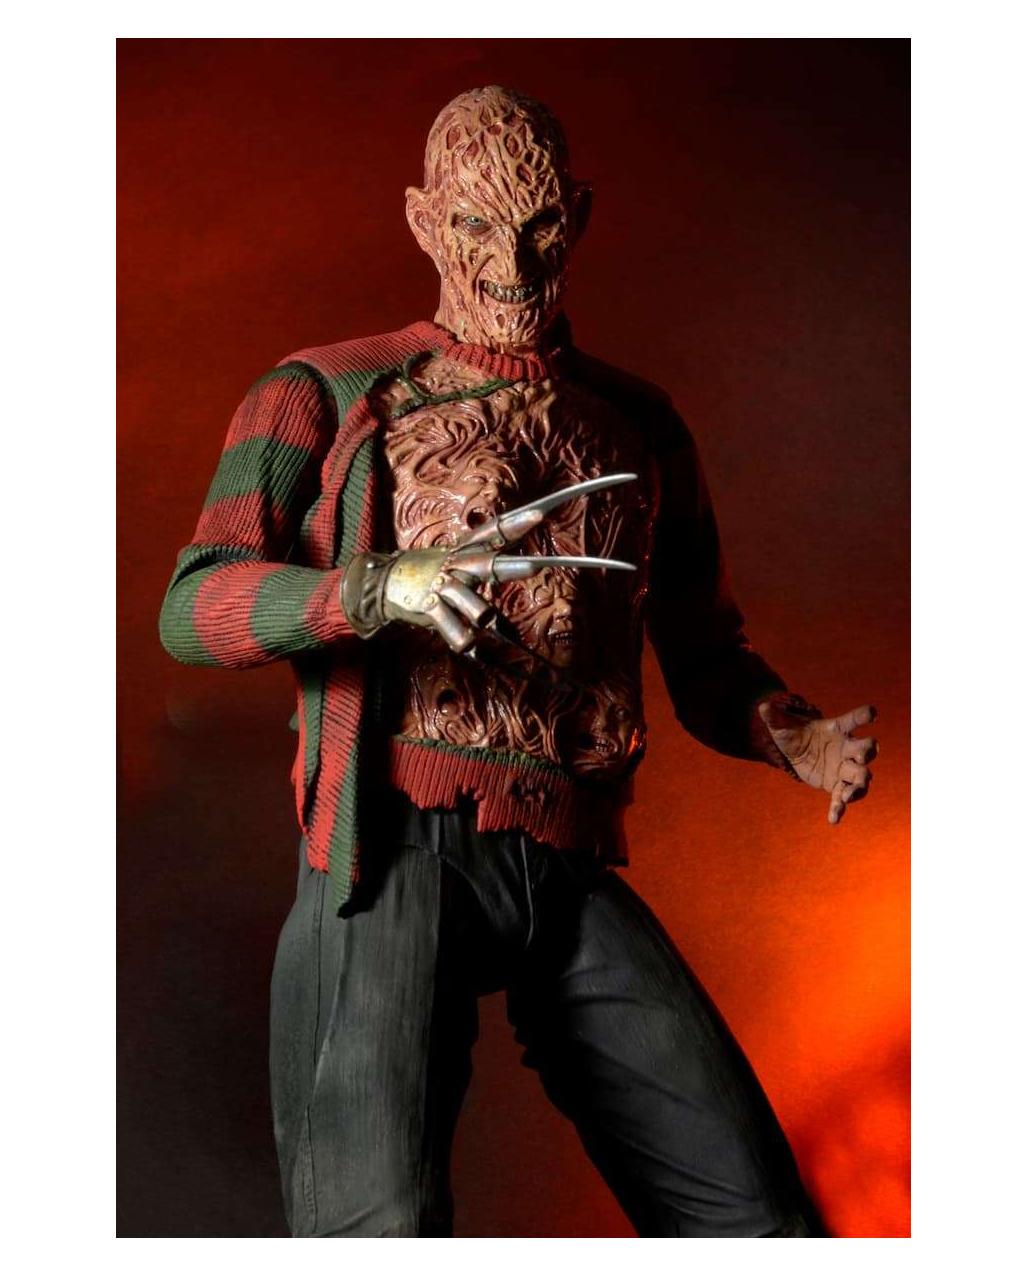 Freddy Krueger Halloween Decorations